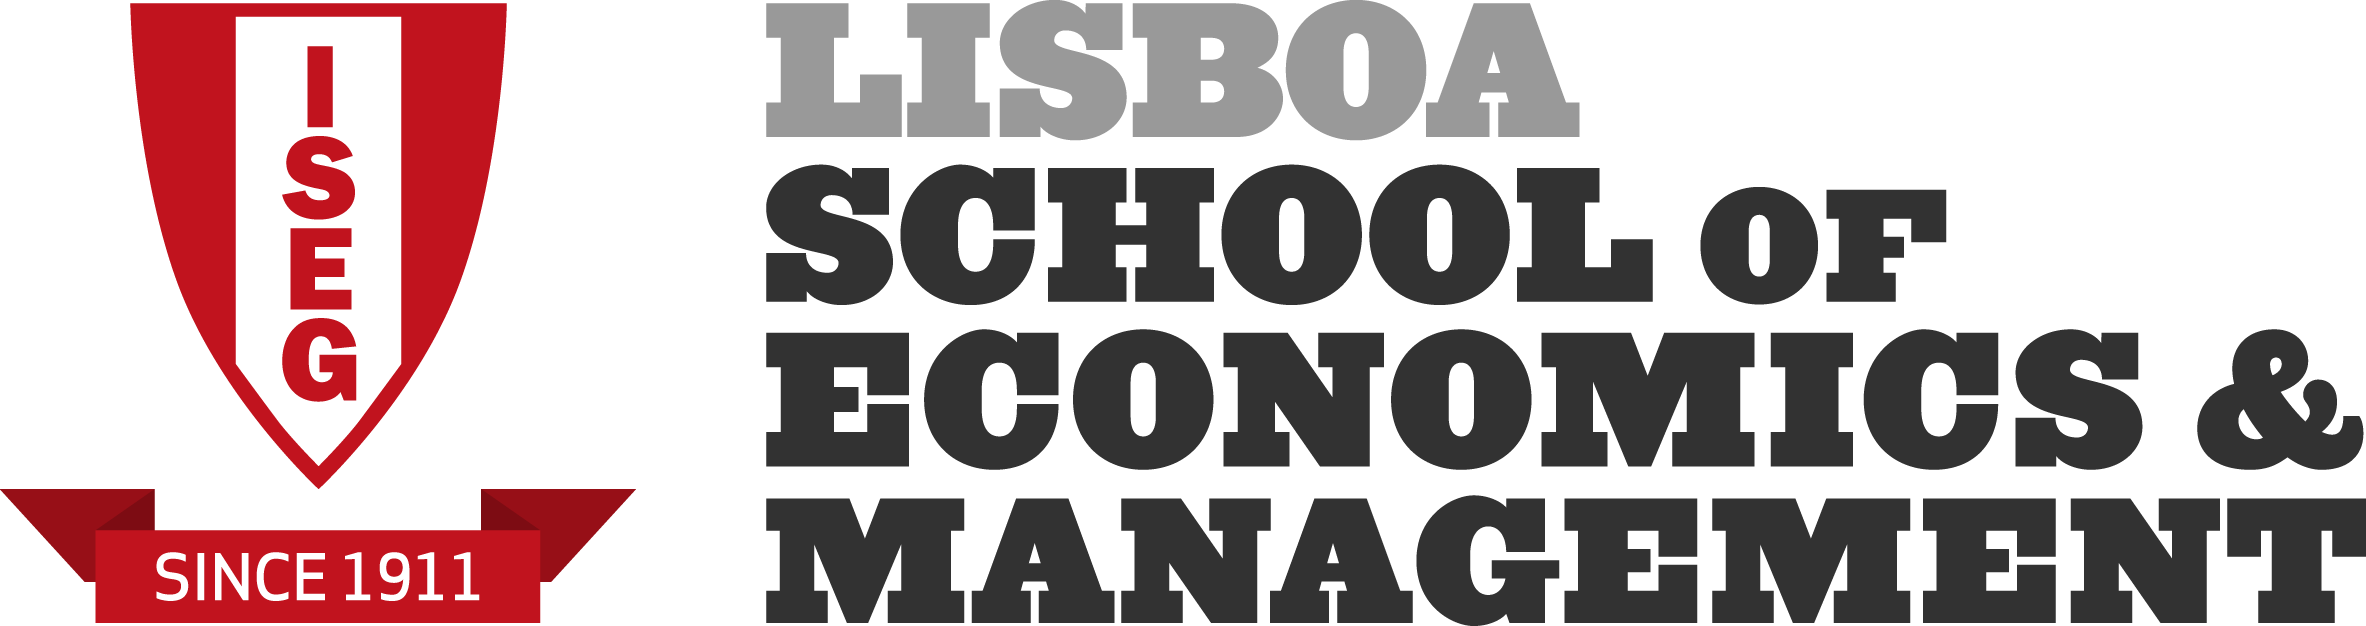 Portugal lisbon school of economics management rwth aachen portugal lisbon school of economics management publicscrutiny Image collections